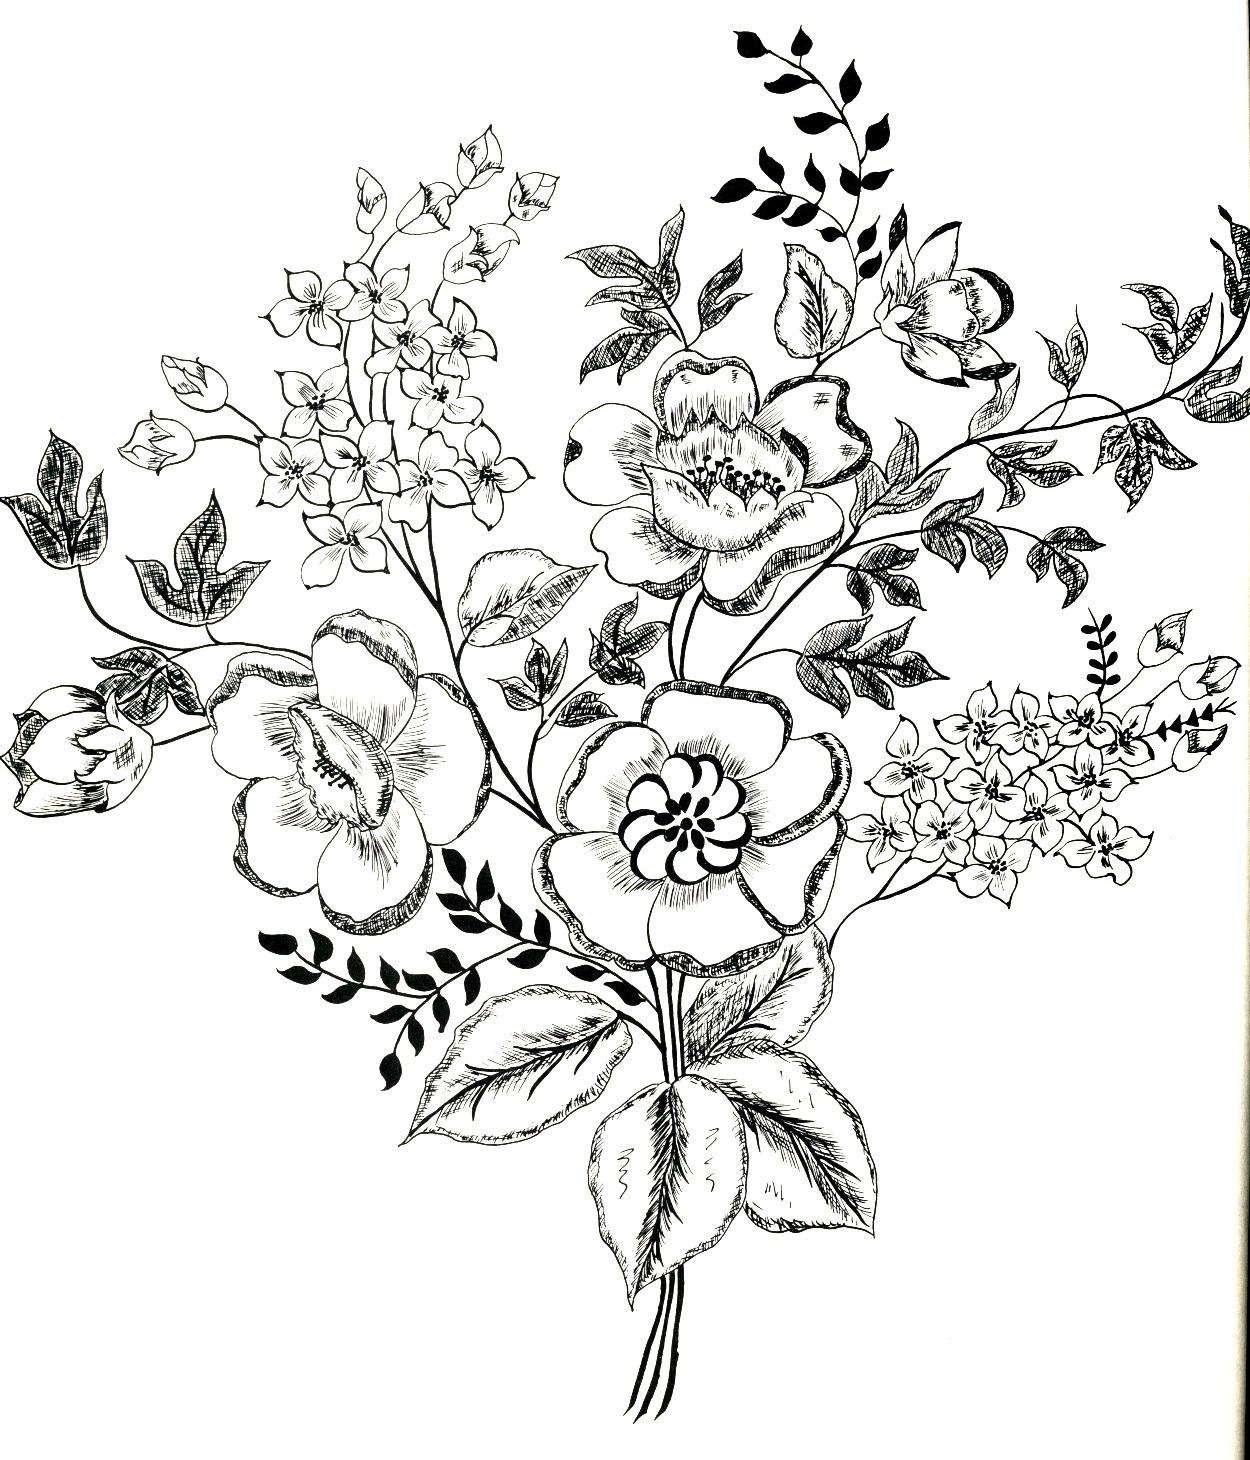 1250x1460 Flower Line Drawings. Flower Type Of Line Drawing Vector Diagram